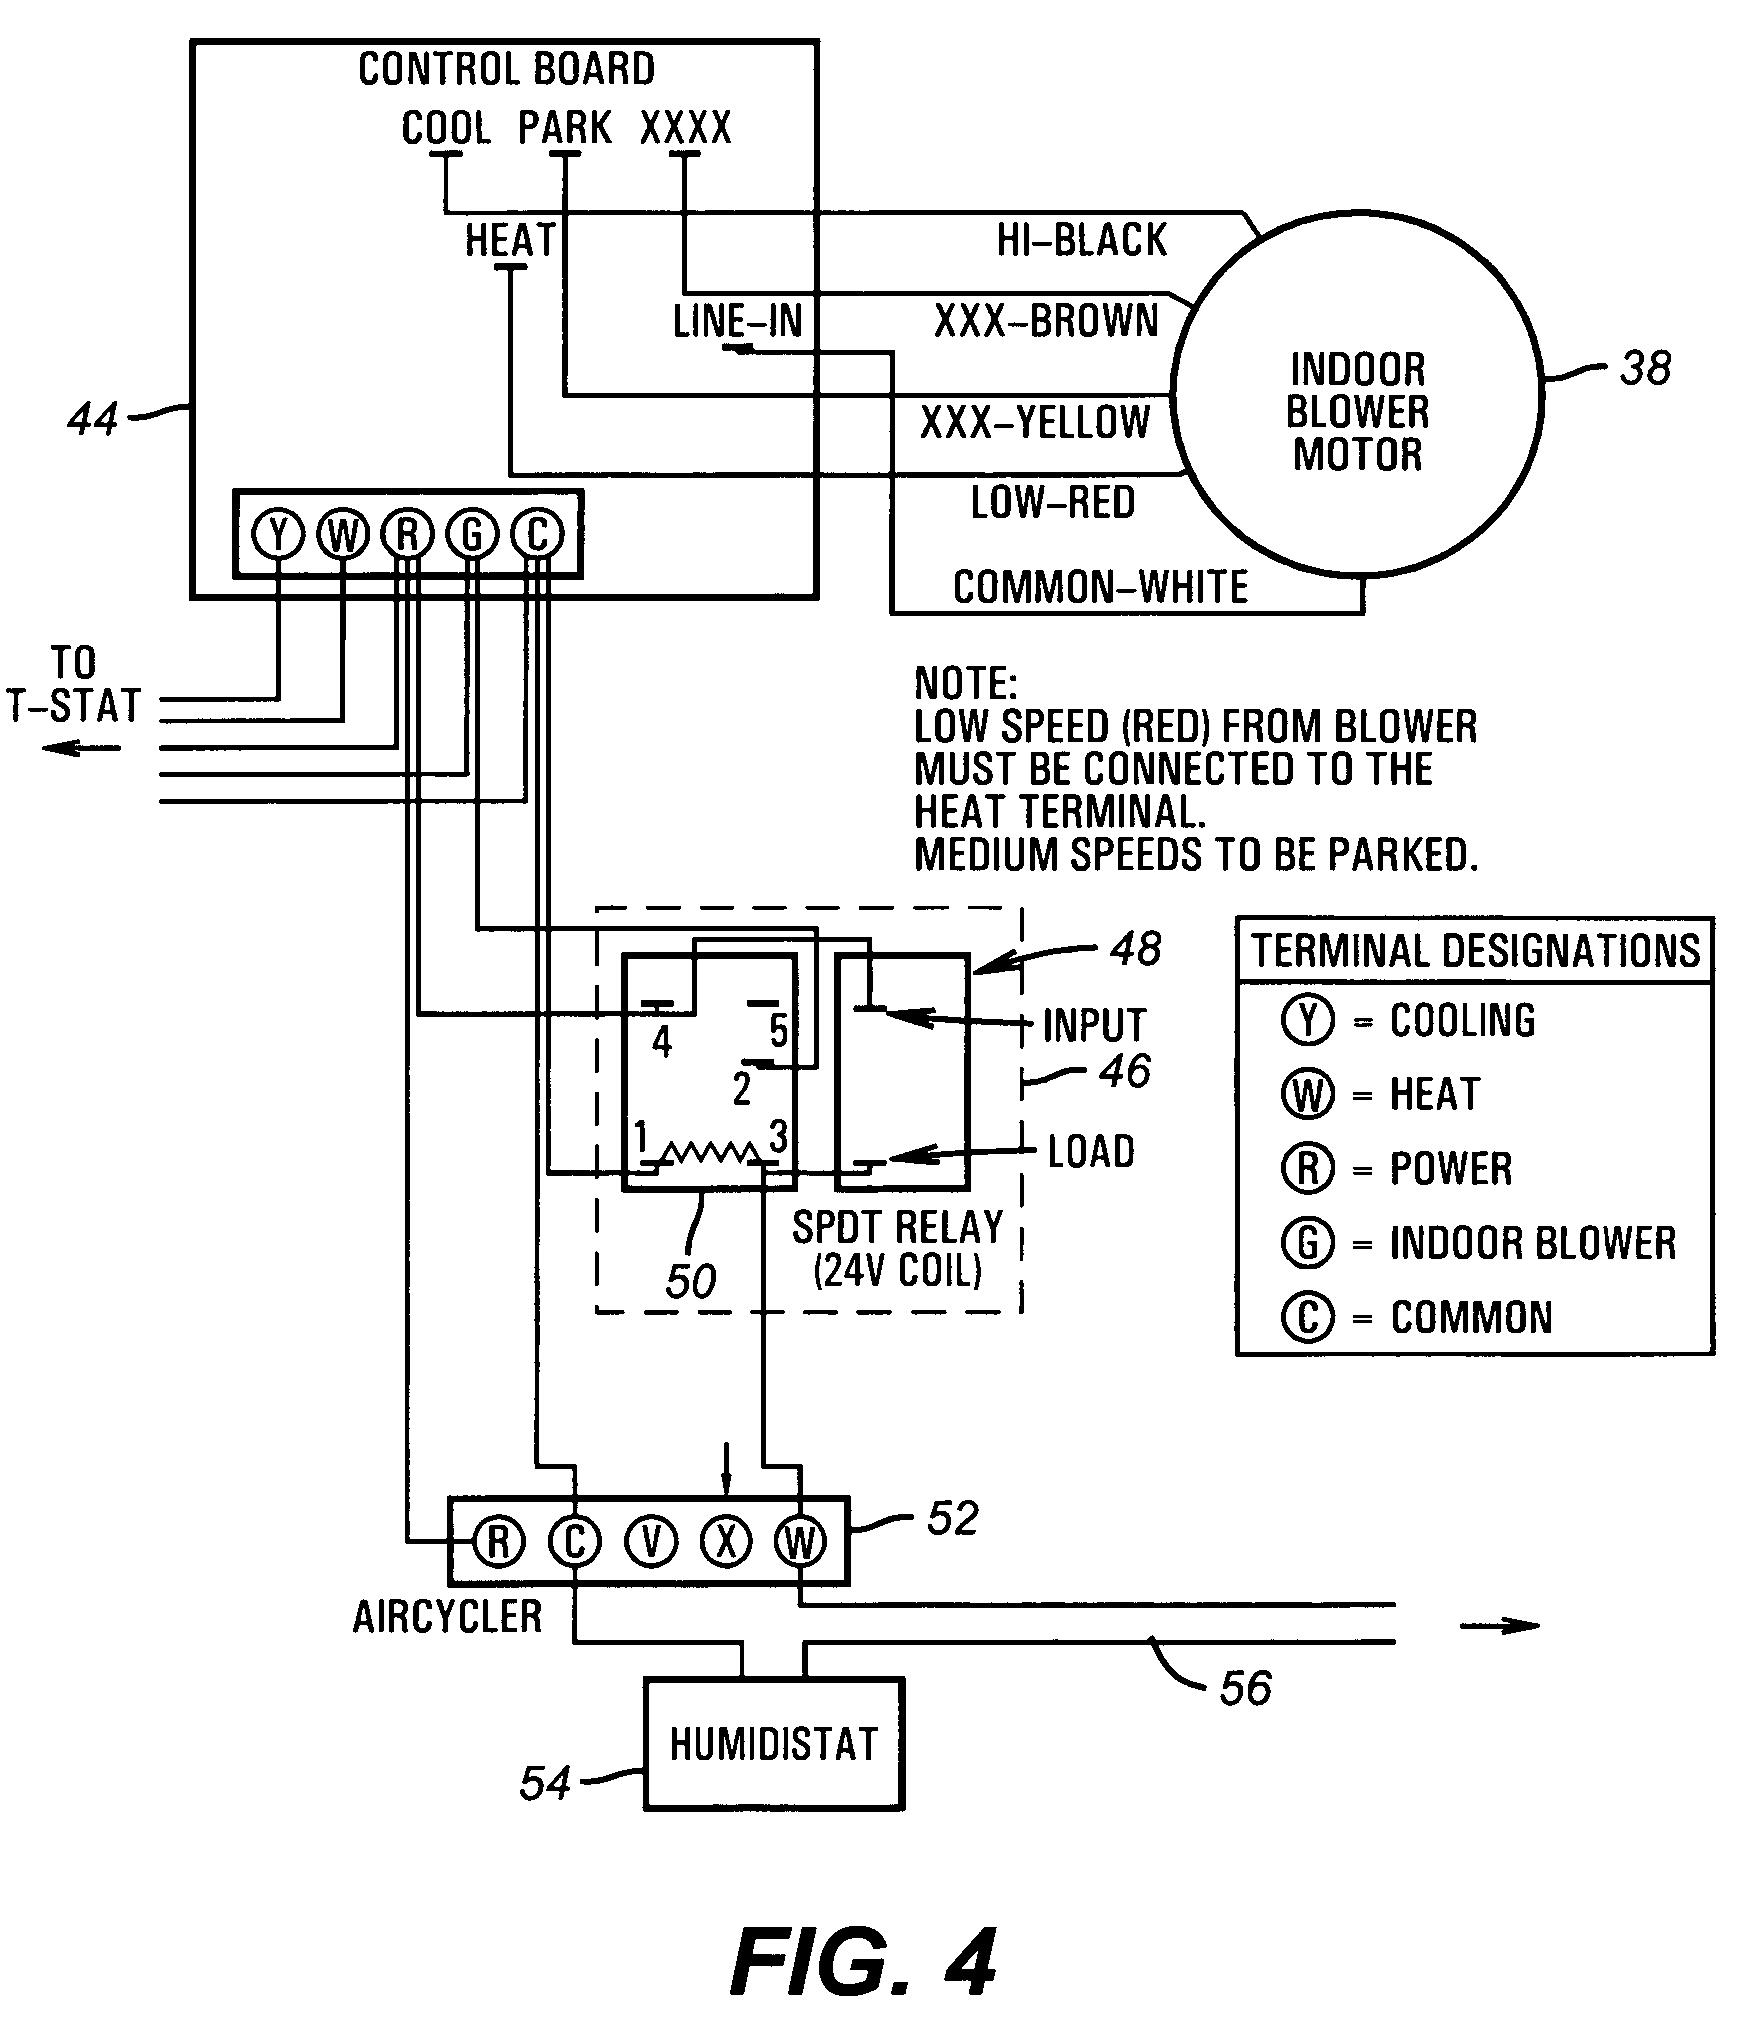 fan coil unit wiring diagram